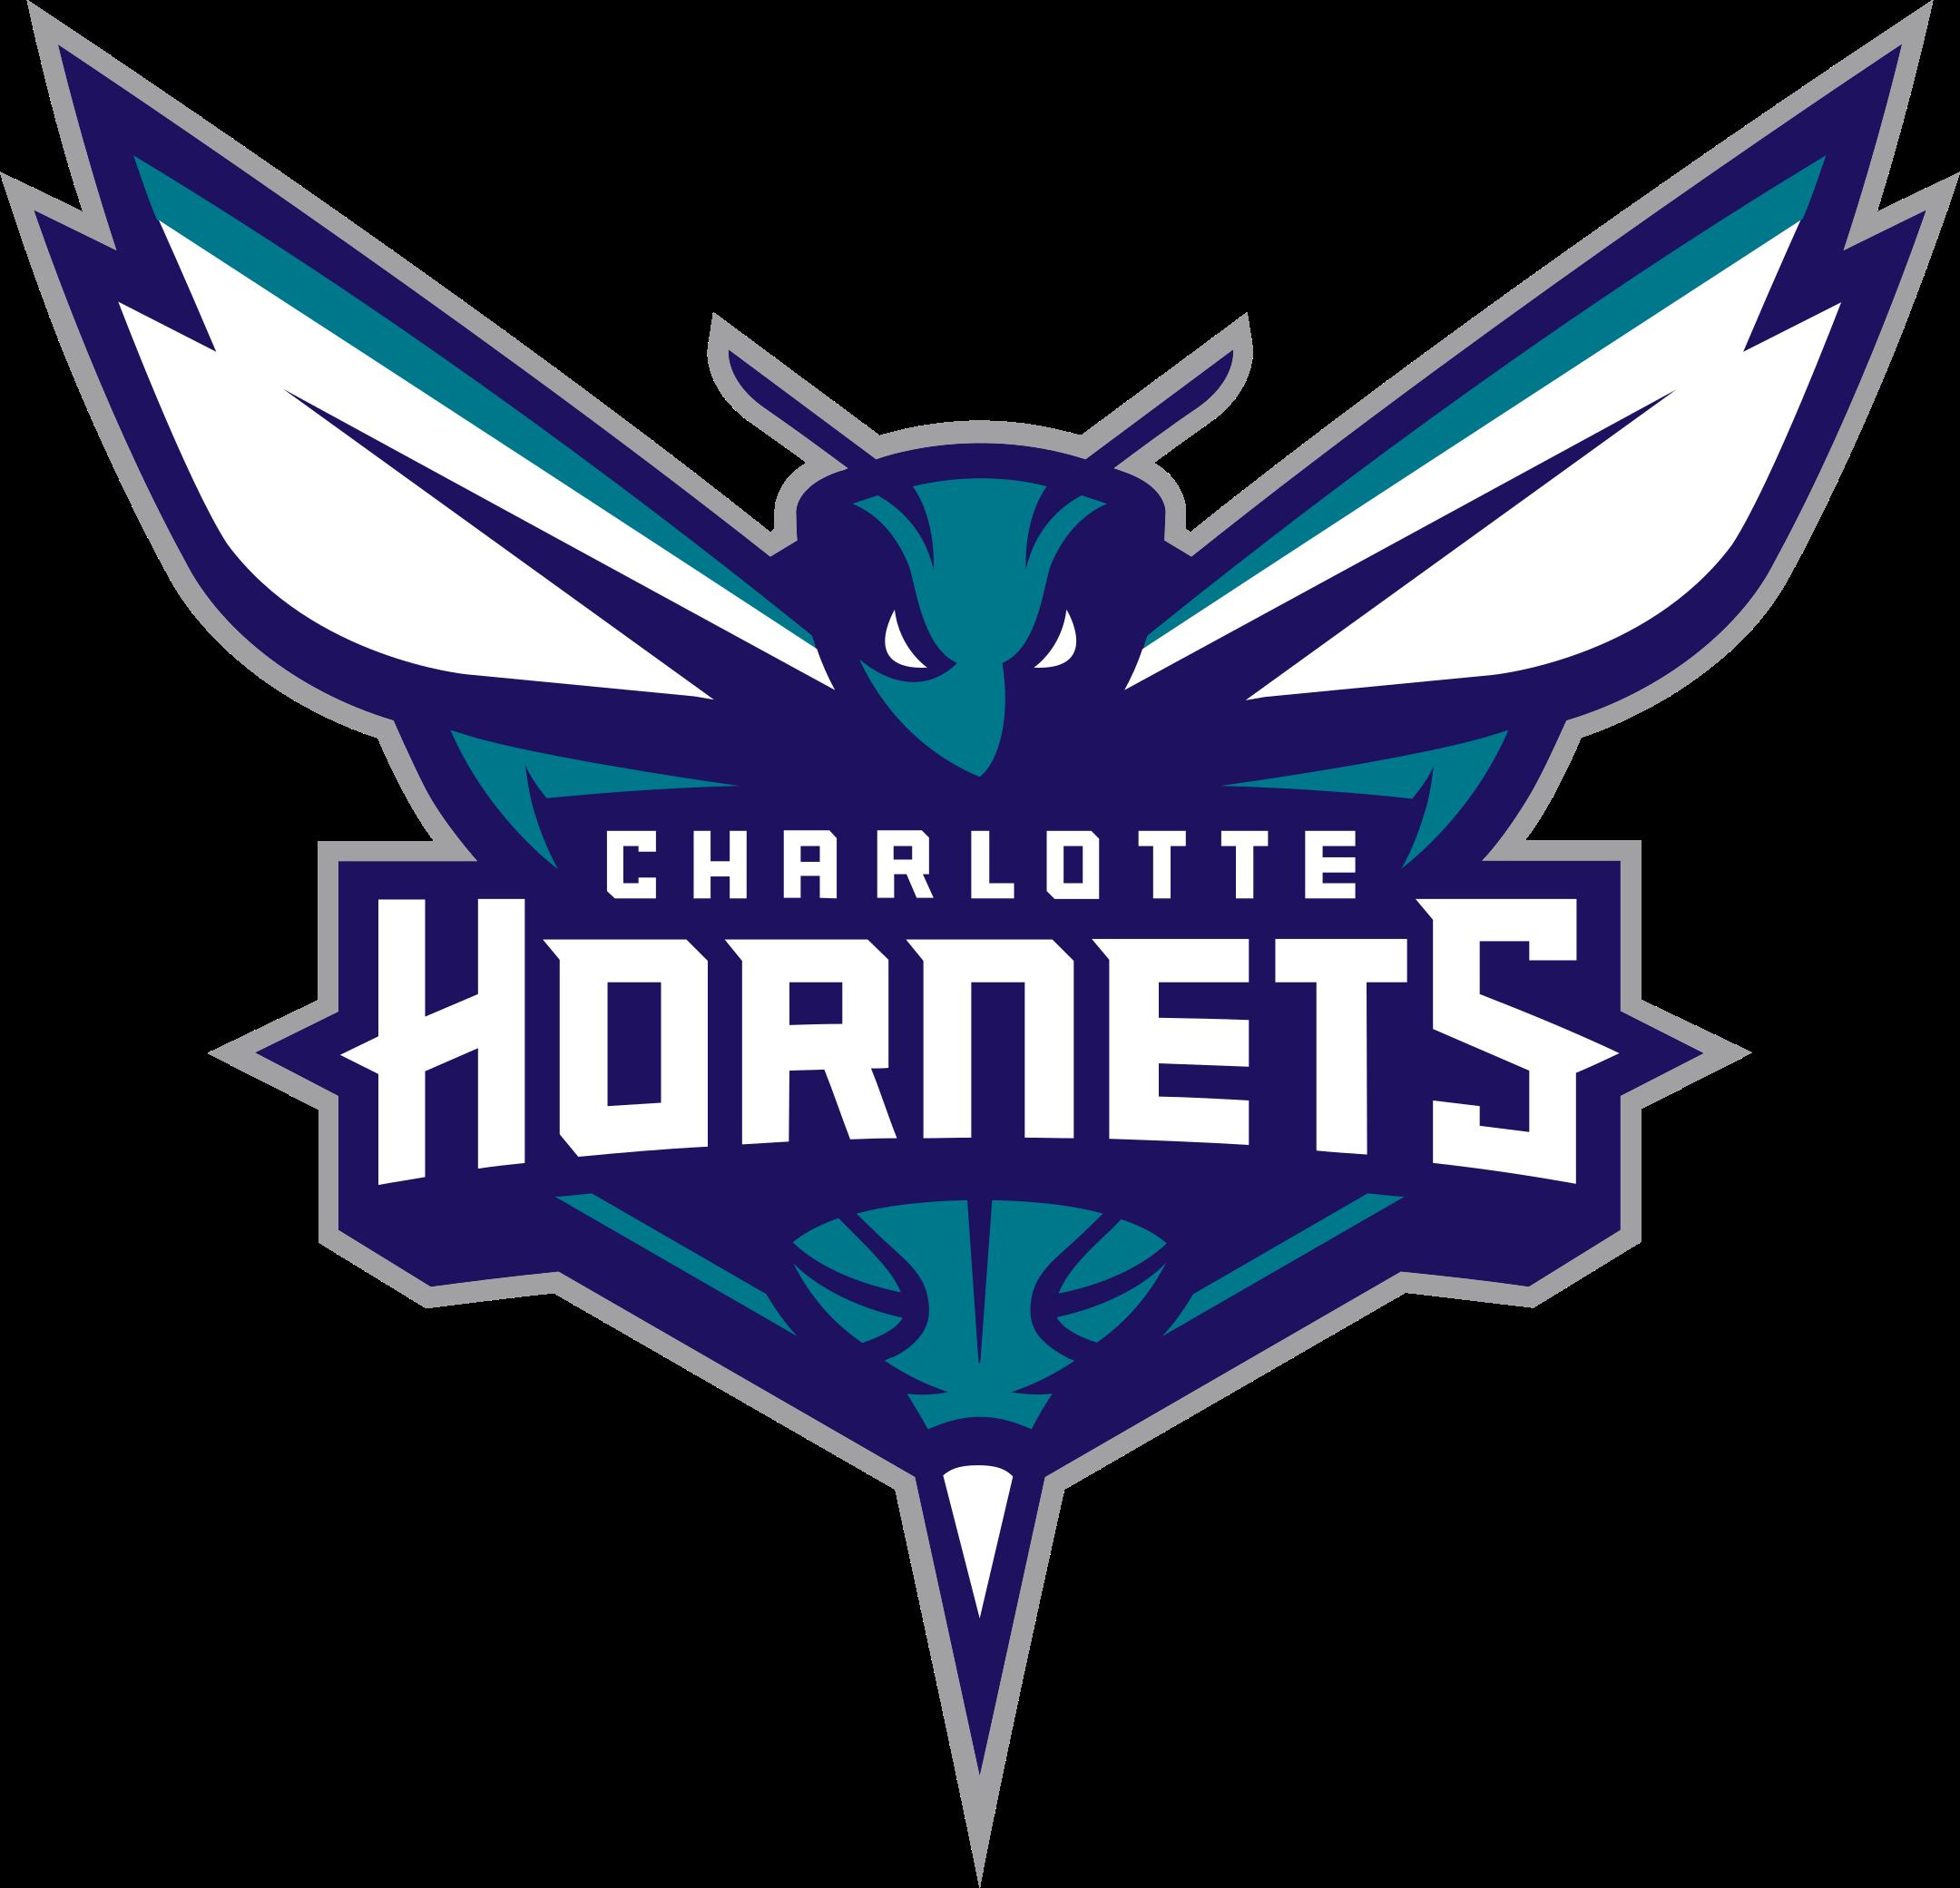 charlotte hornets logo 1 - Charlotte Hornets Logo